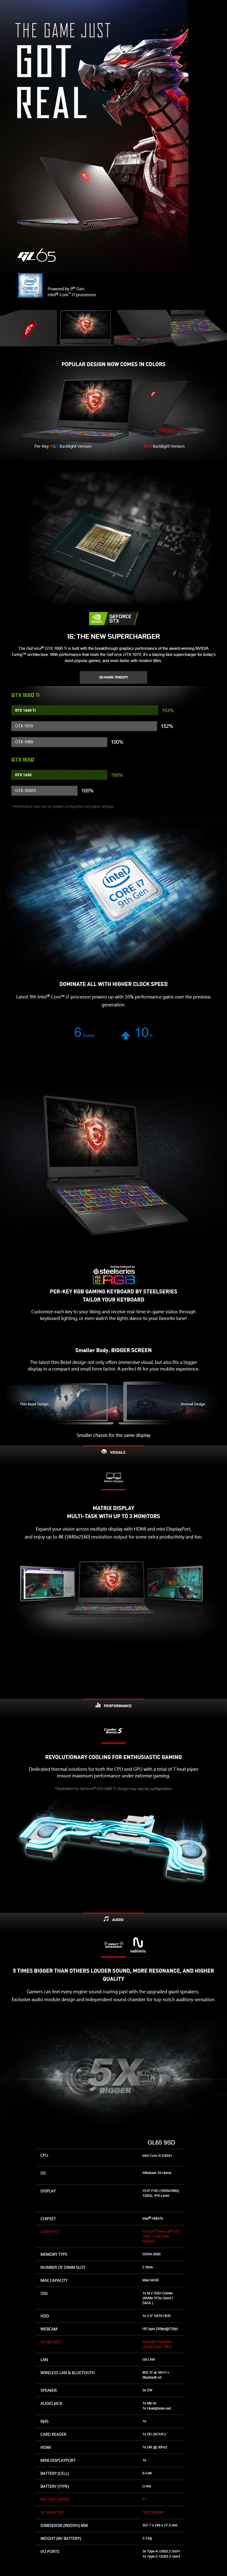 "MSI GL65 9SD 15.6"" 120Hz Laptop i5-9300H 16GB 512GB SSD GTX1660Ti Win10H - Overview 1"